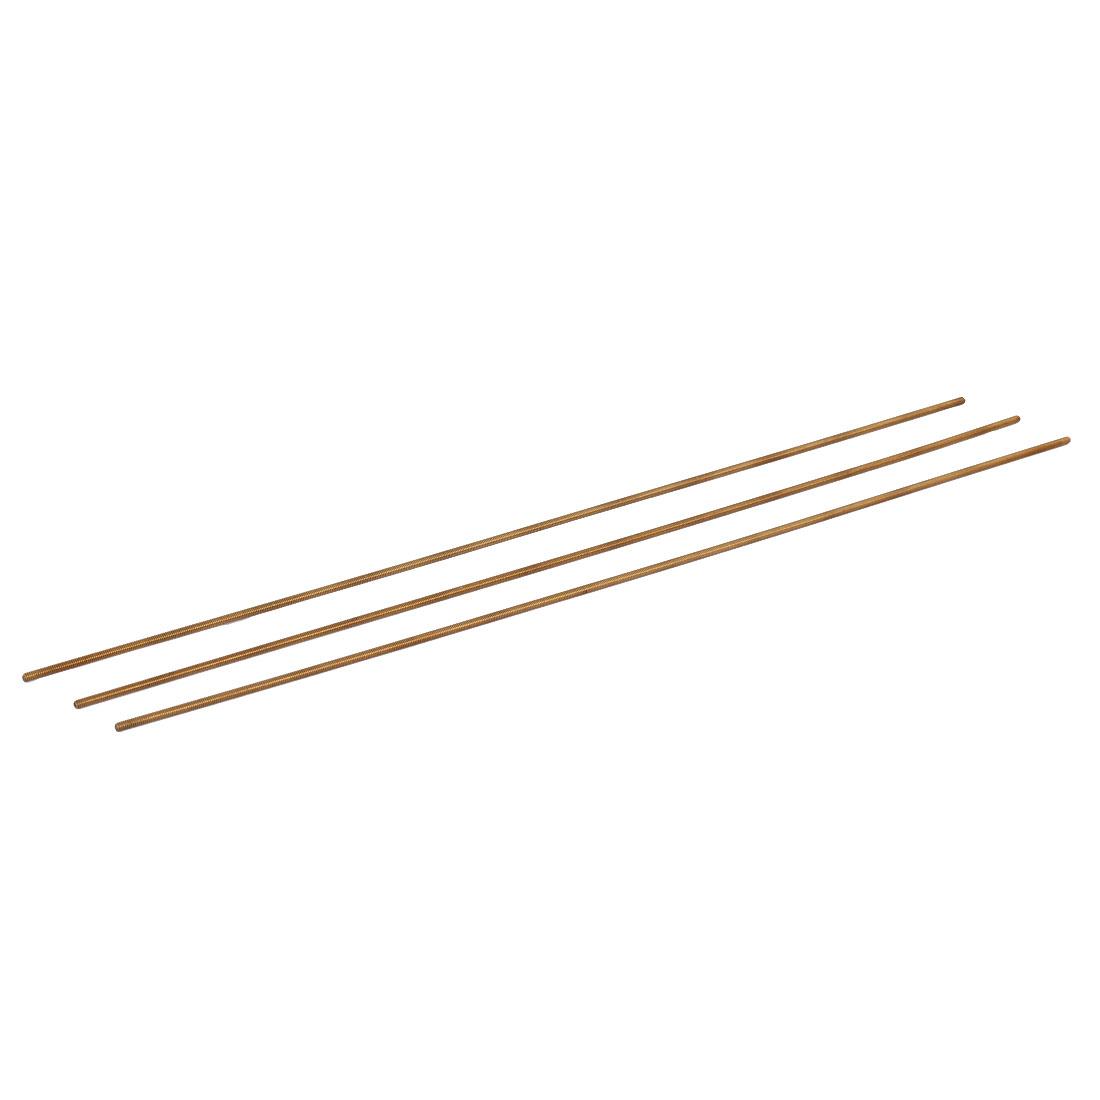 M2 x 250mm Male Threaded 0.4mm Pitch All Thread Brass Rod Bar Gold Tone 3 Pcs